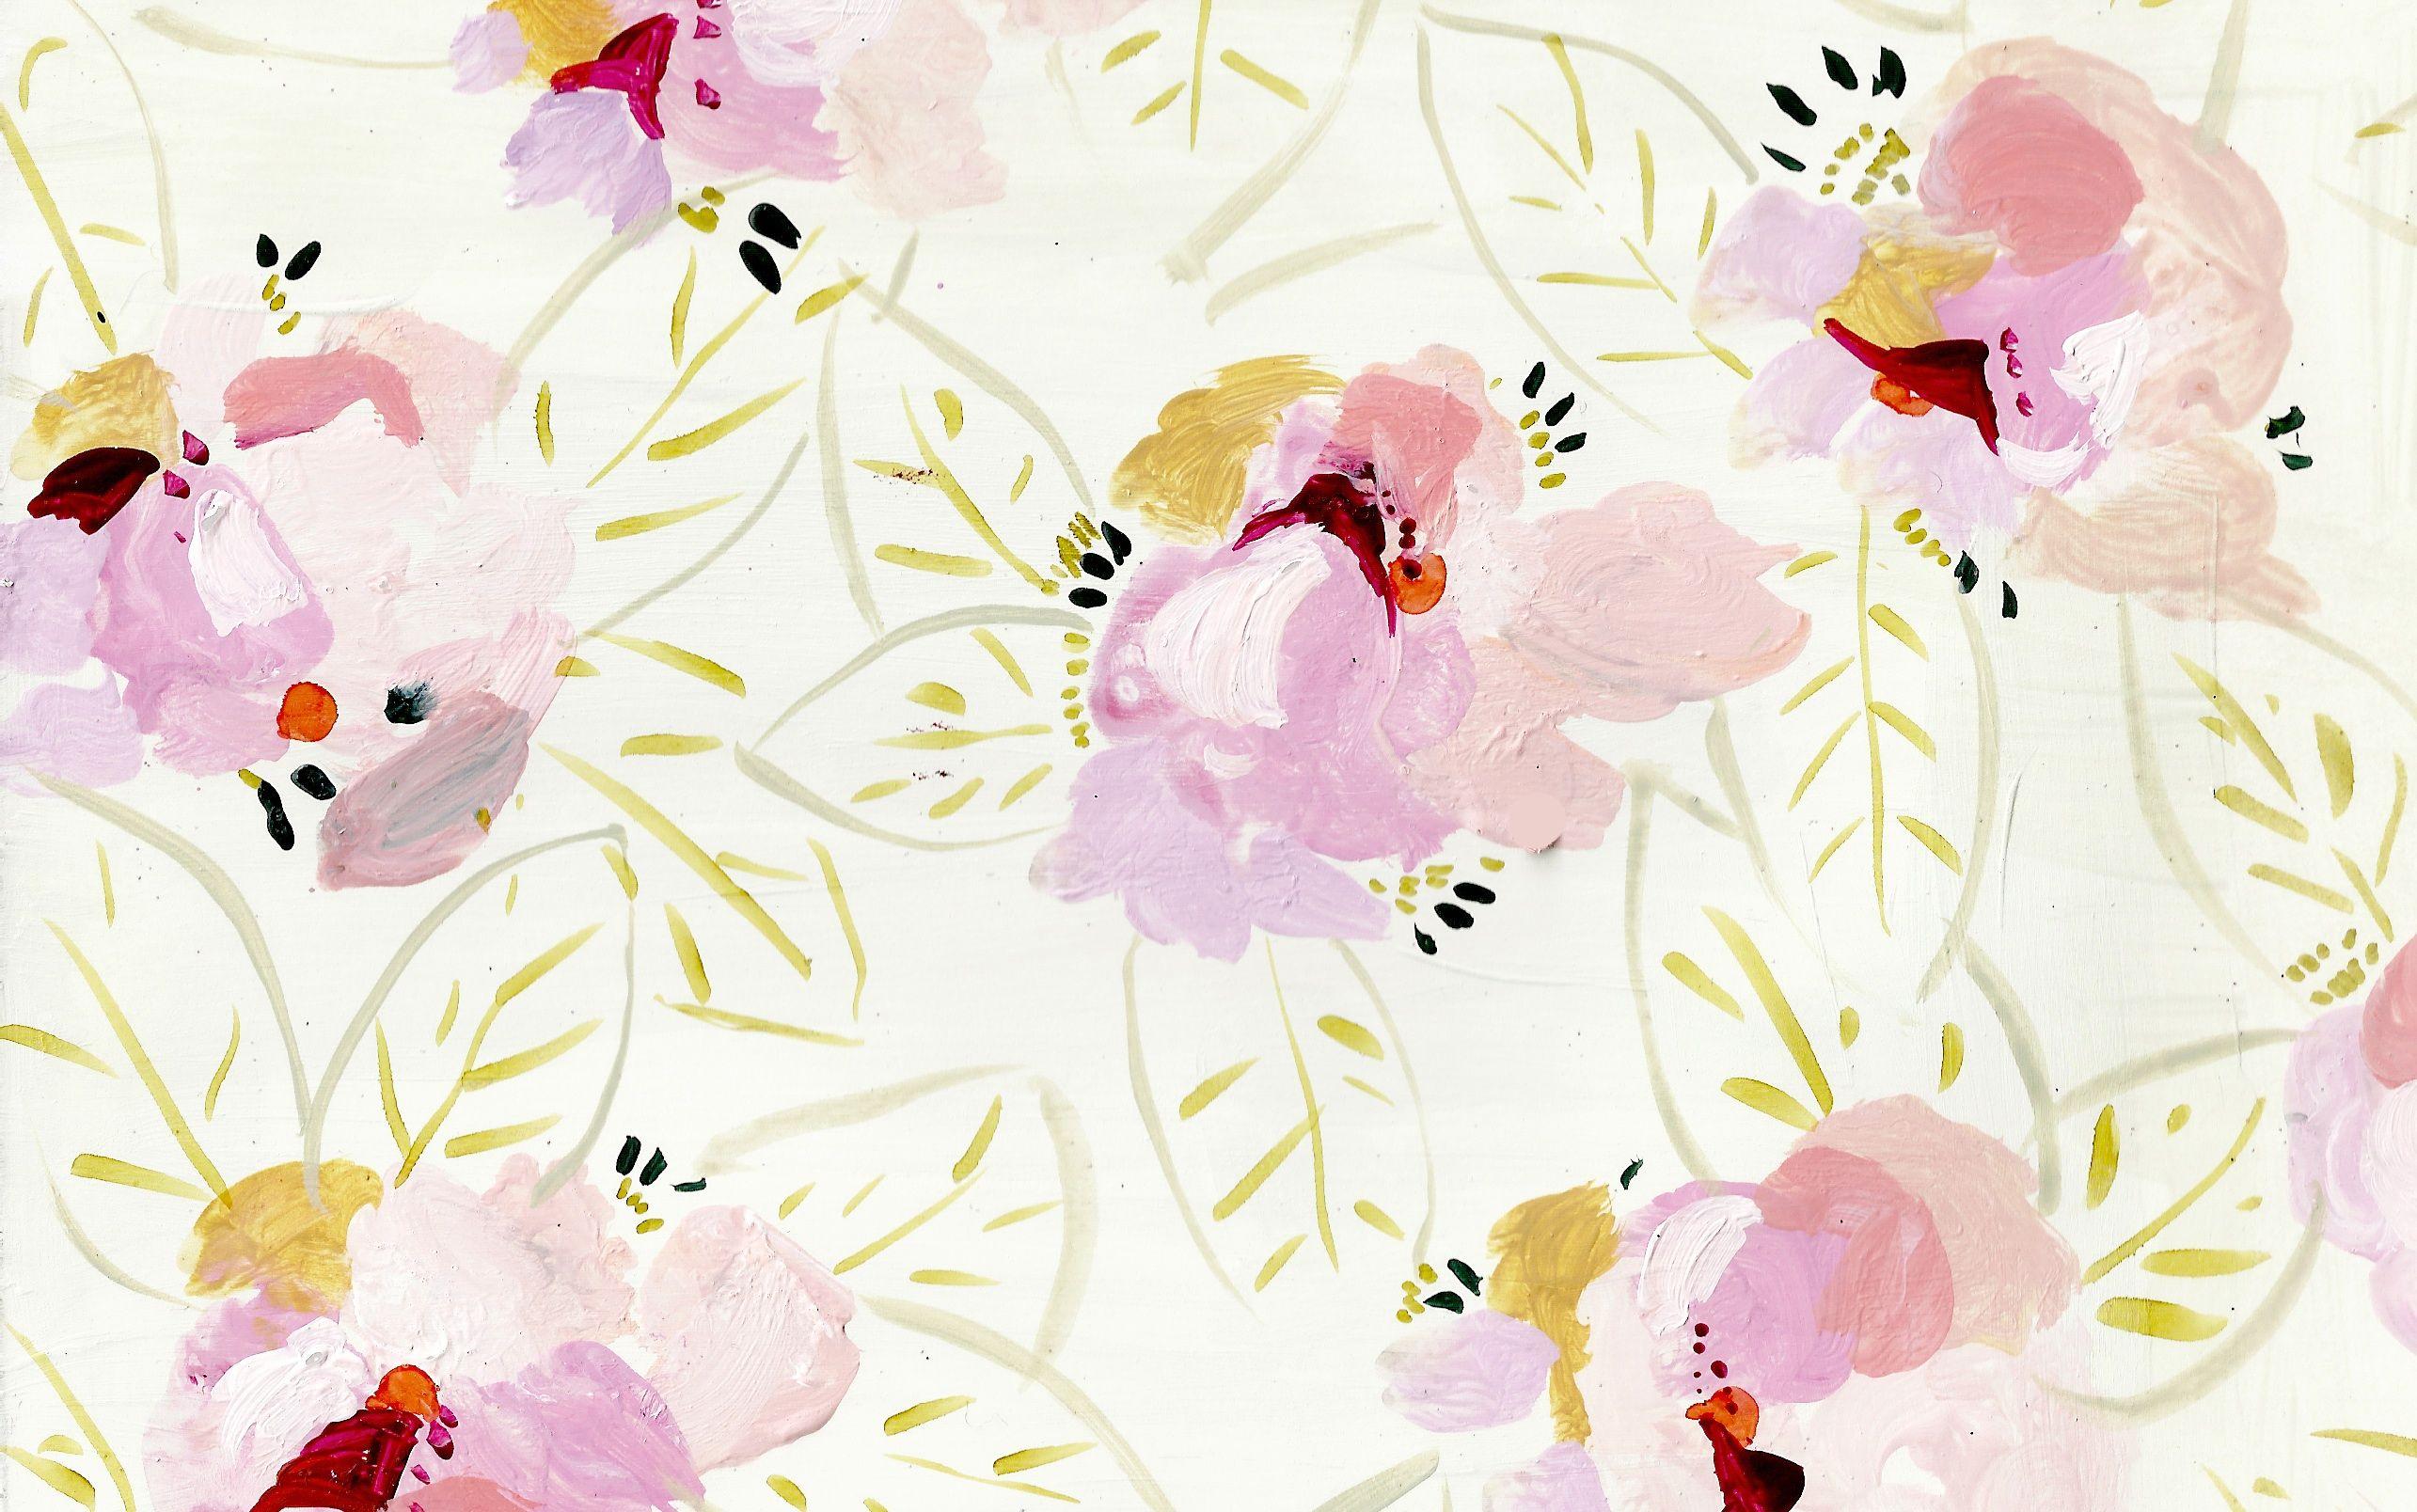 Cute Kade Spade Phone Wallpaper Pin It Like 1 Image D I Y Pinterest Wallpaper